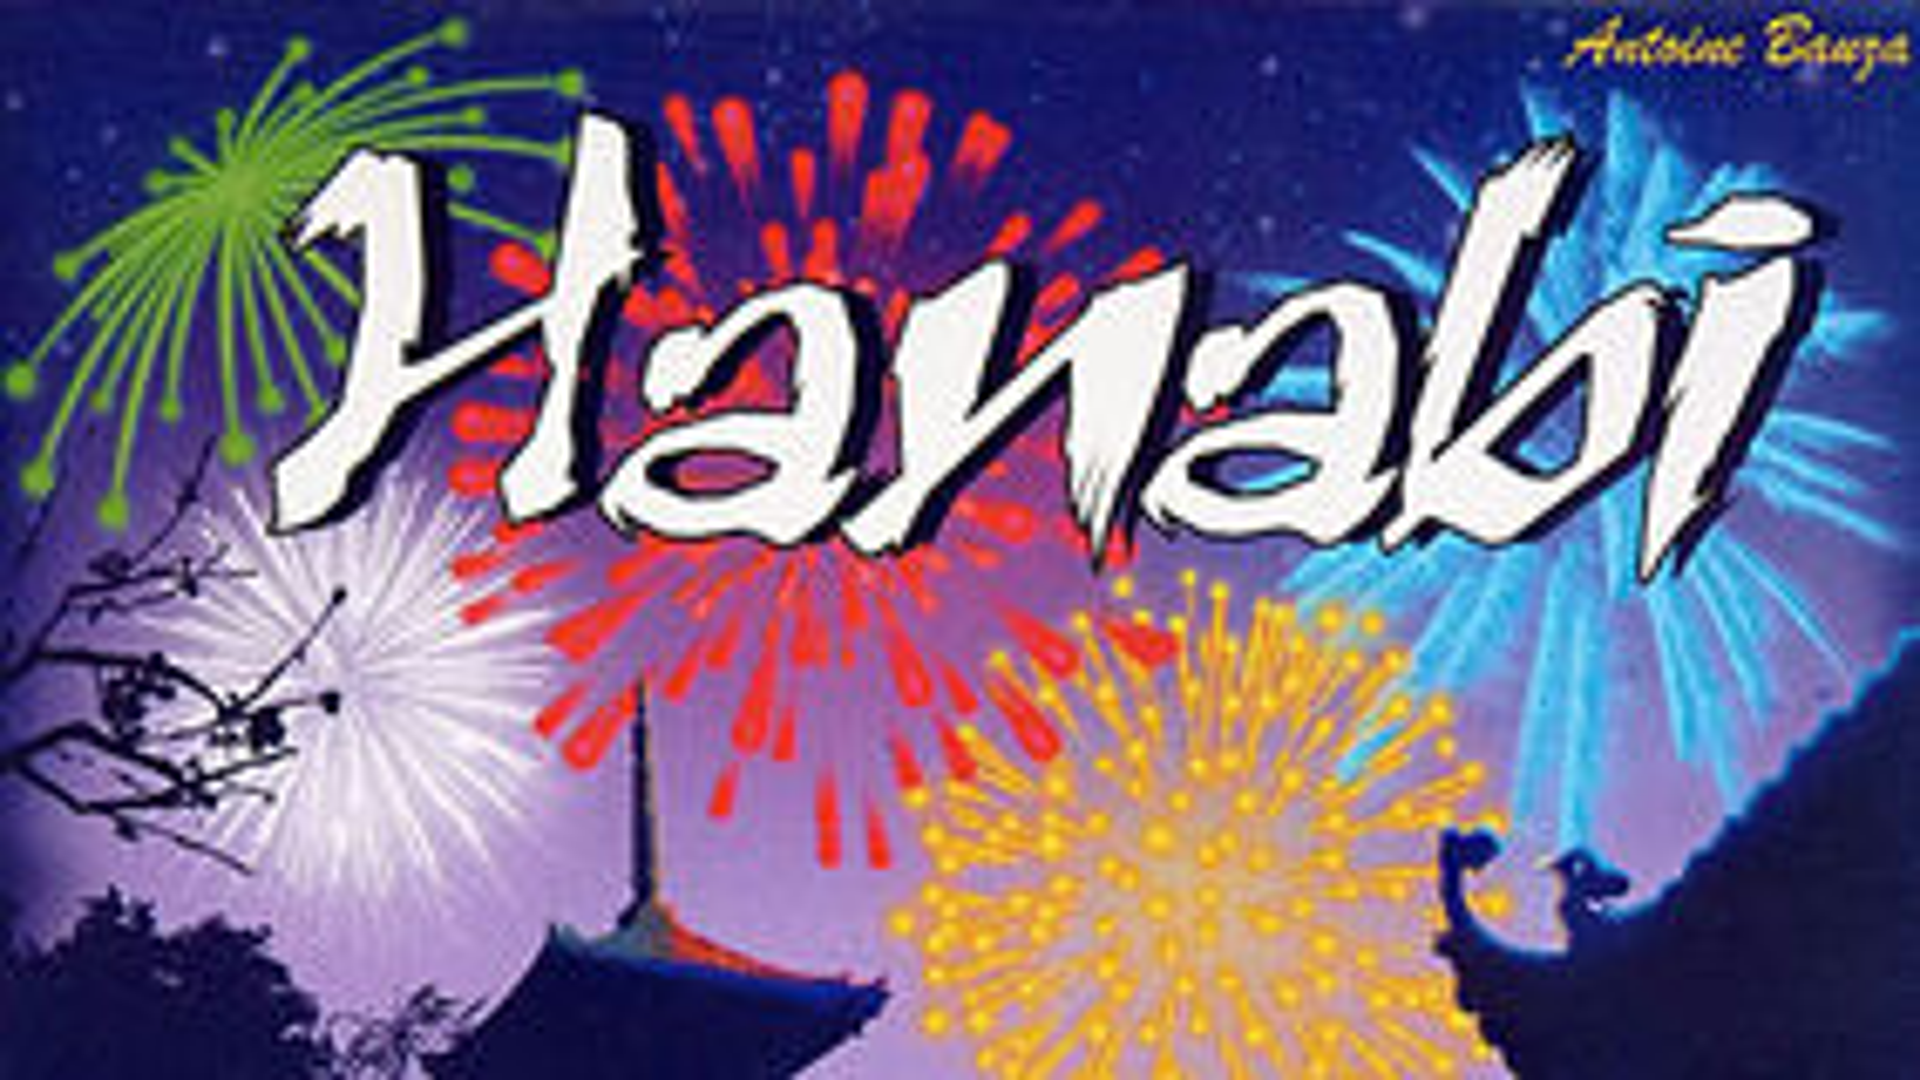 Hanabi board game artwork